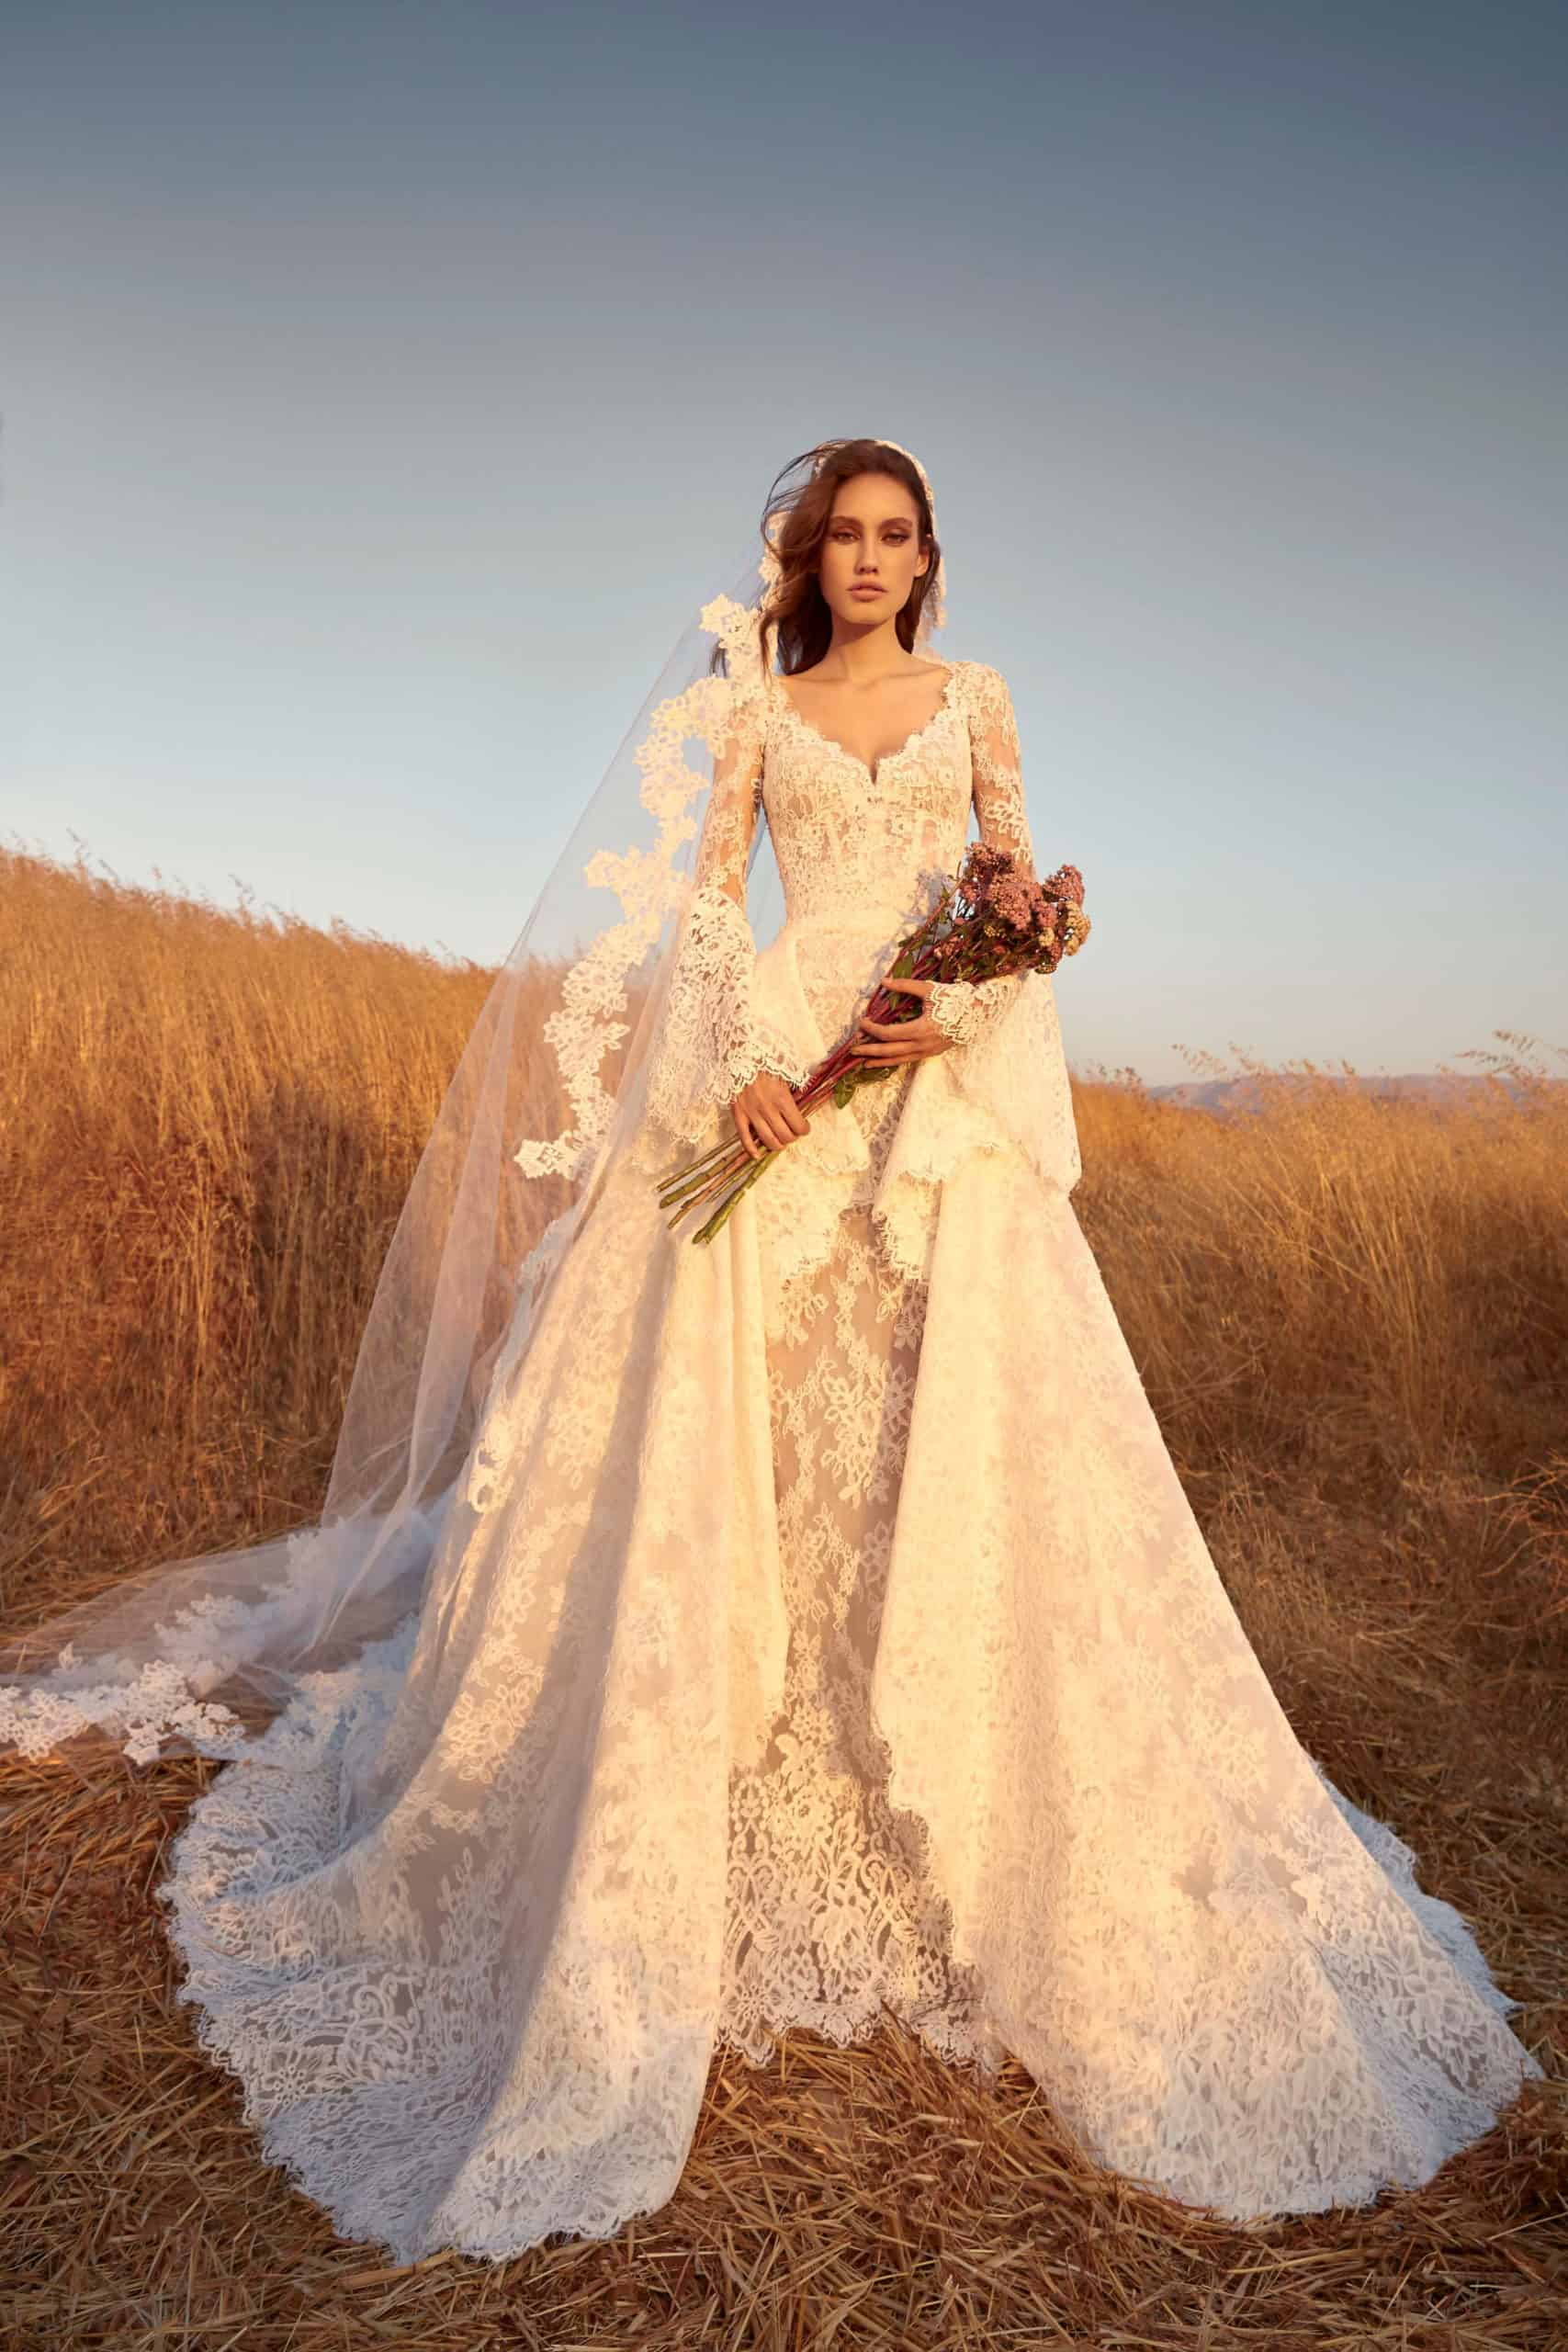 heavy lace a-line wedding dress by Zuhair Murad